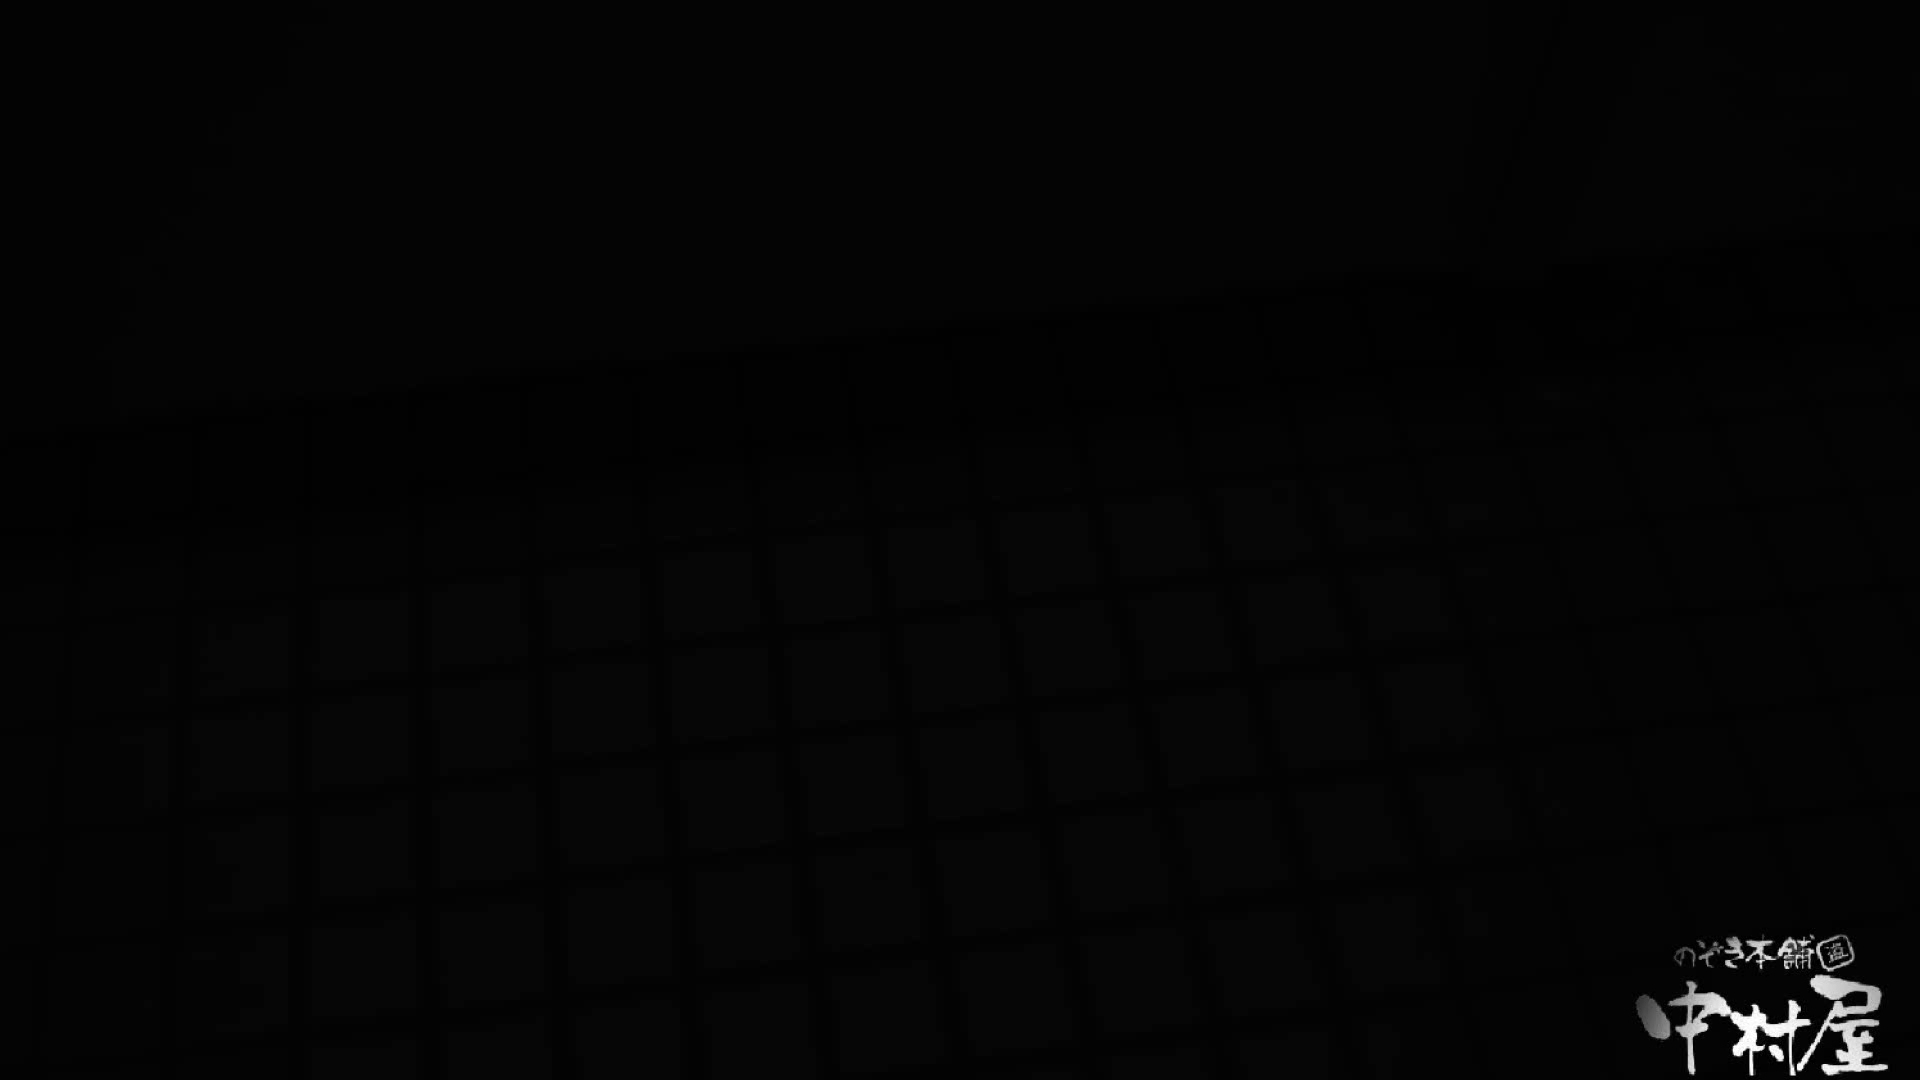 VIP魂のかわや盗撮62連発! 超オマンコ鮮明ギャル! 2発目! リアル黄金水  109画像 60